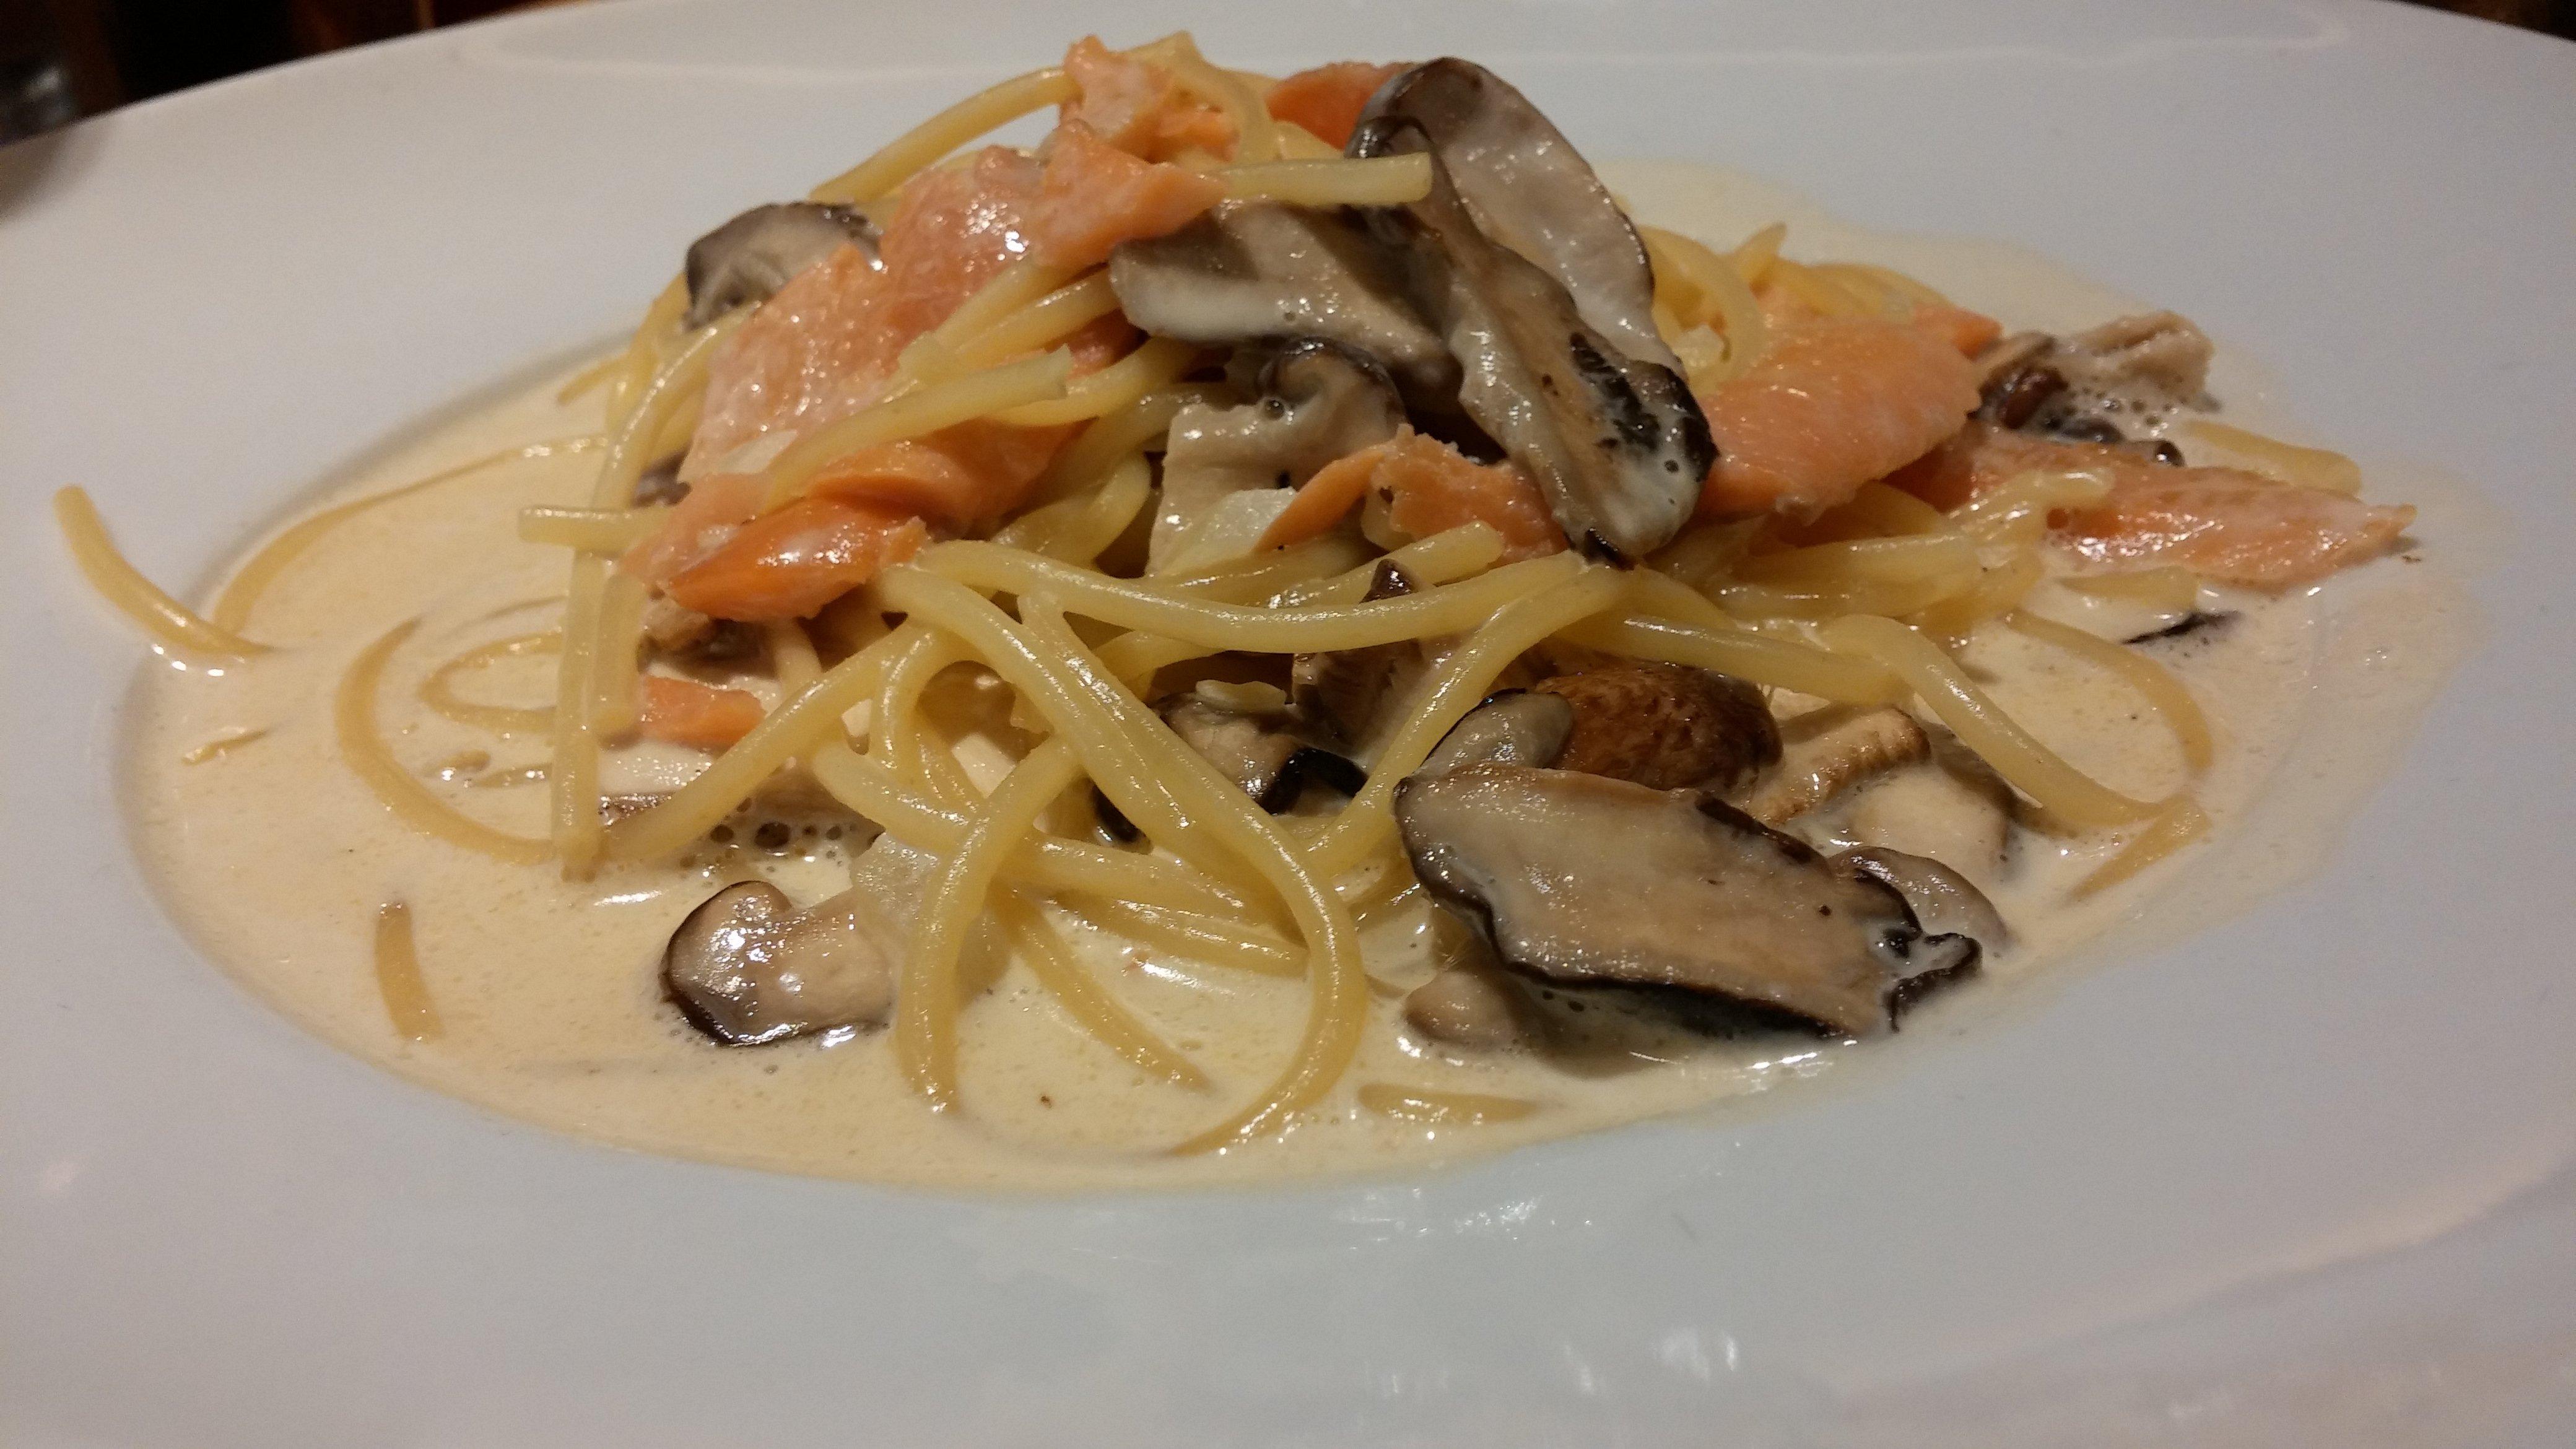 Salmon and mushroom pasta